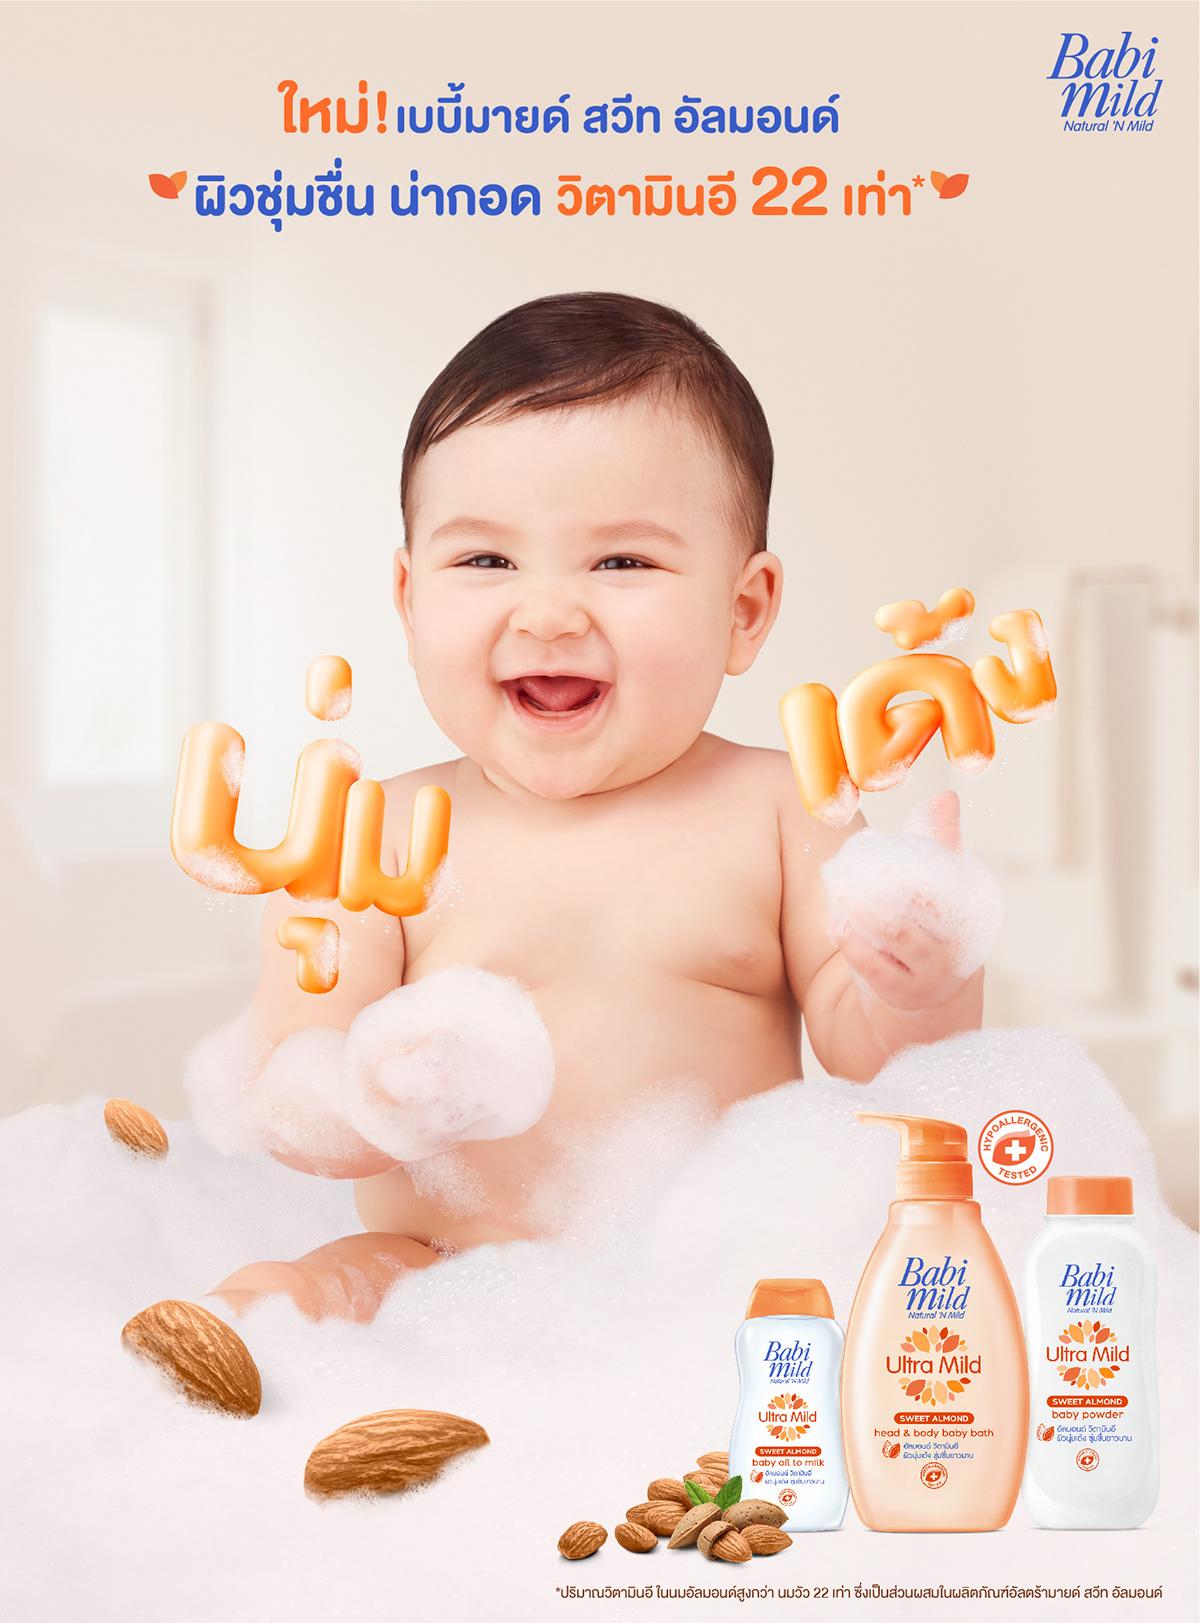 Advertising  baby